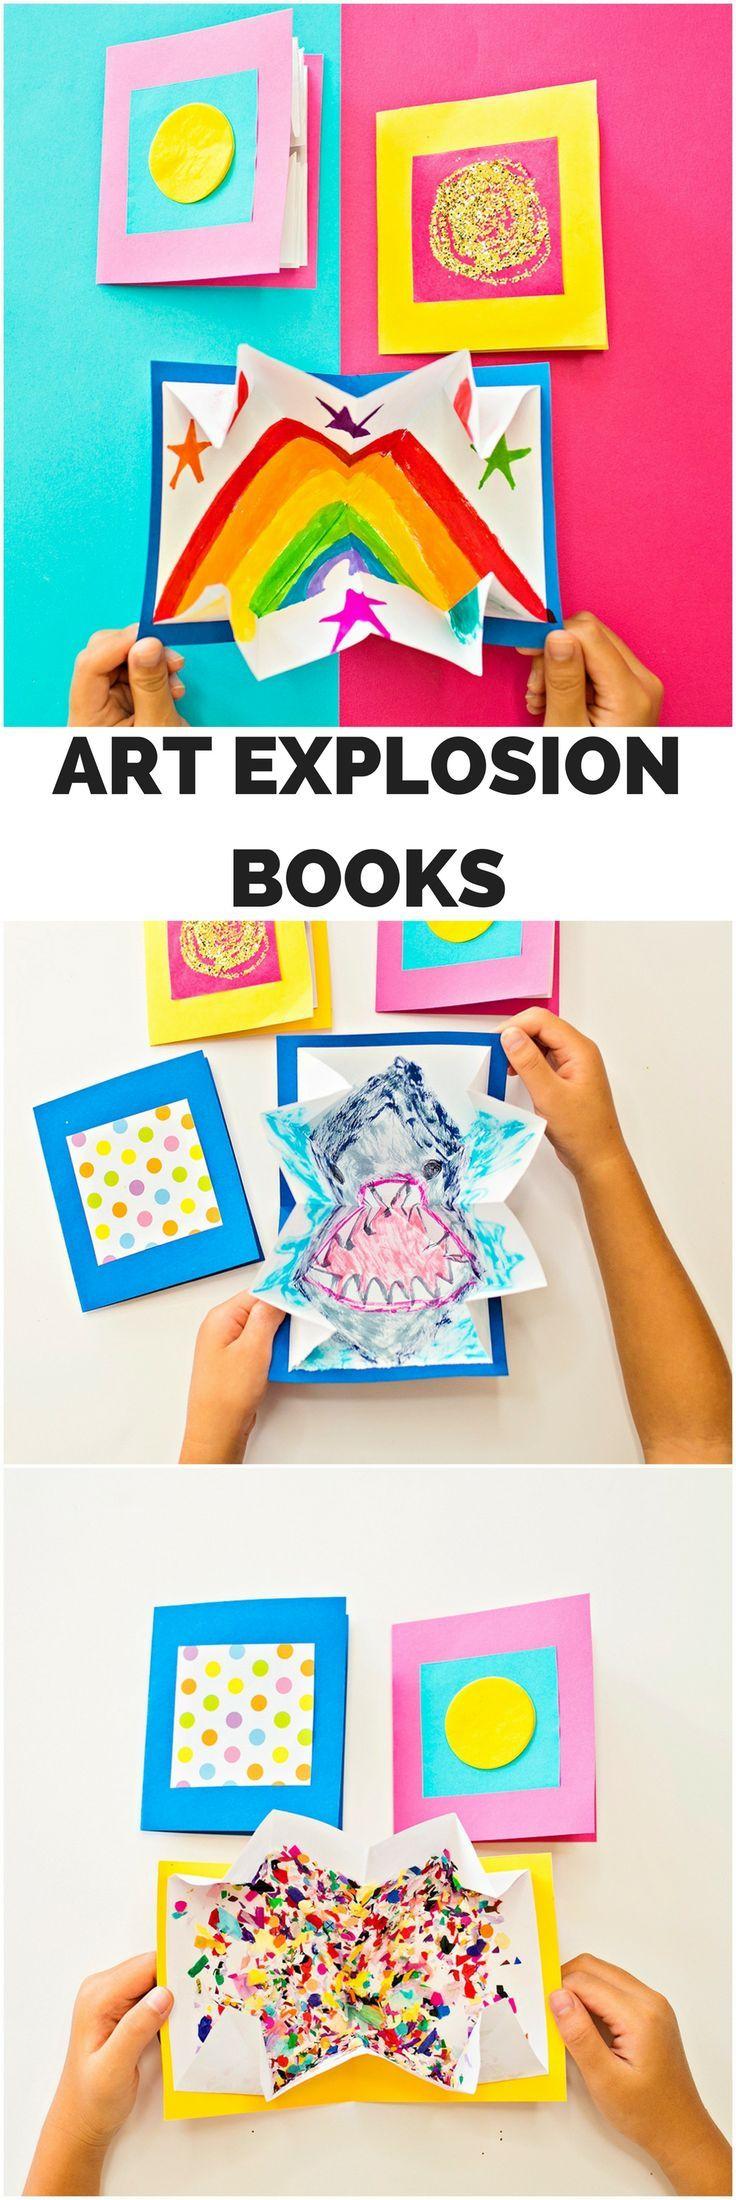 233884672be66a653032997a99be7871 - DIY Art Explosion Books. Fun kids art project #kidsartscraft #KidsCrafts #kidsar...